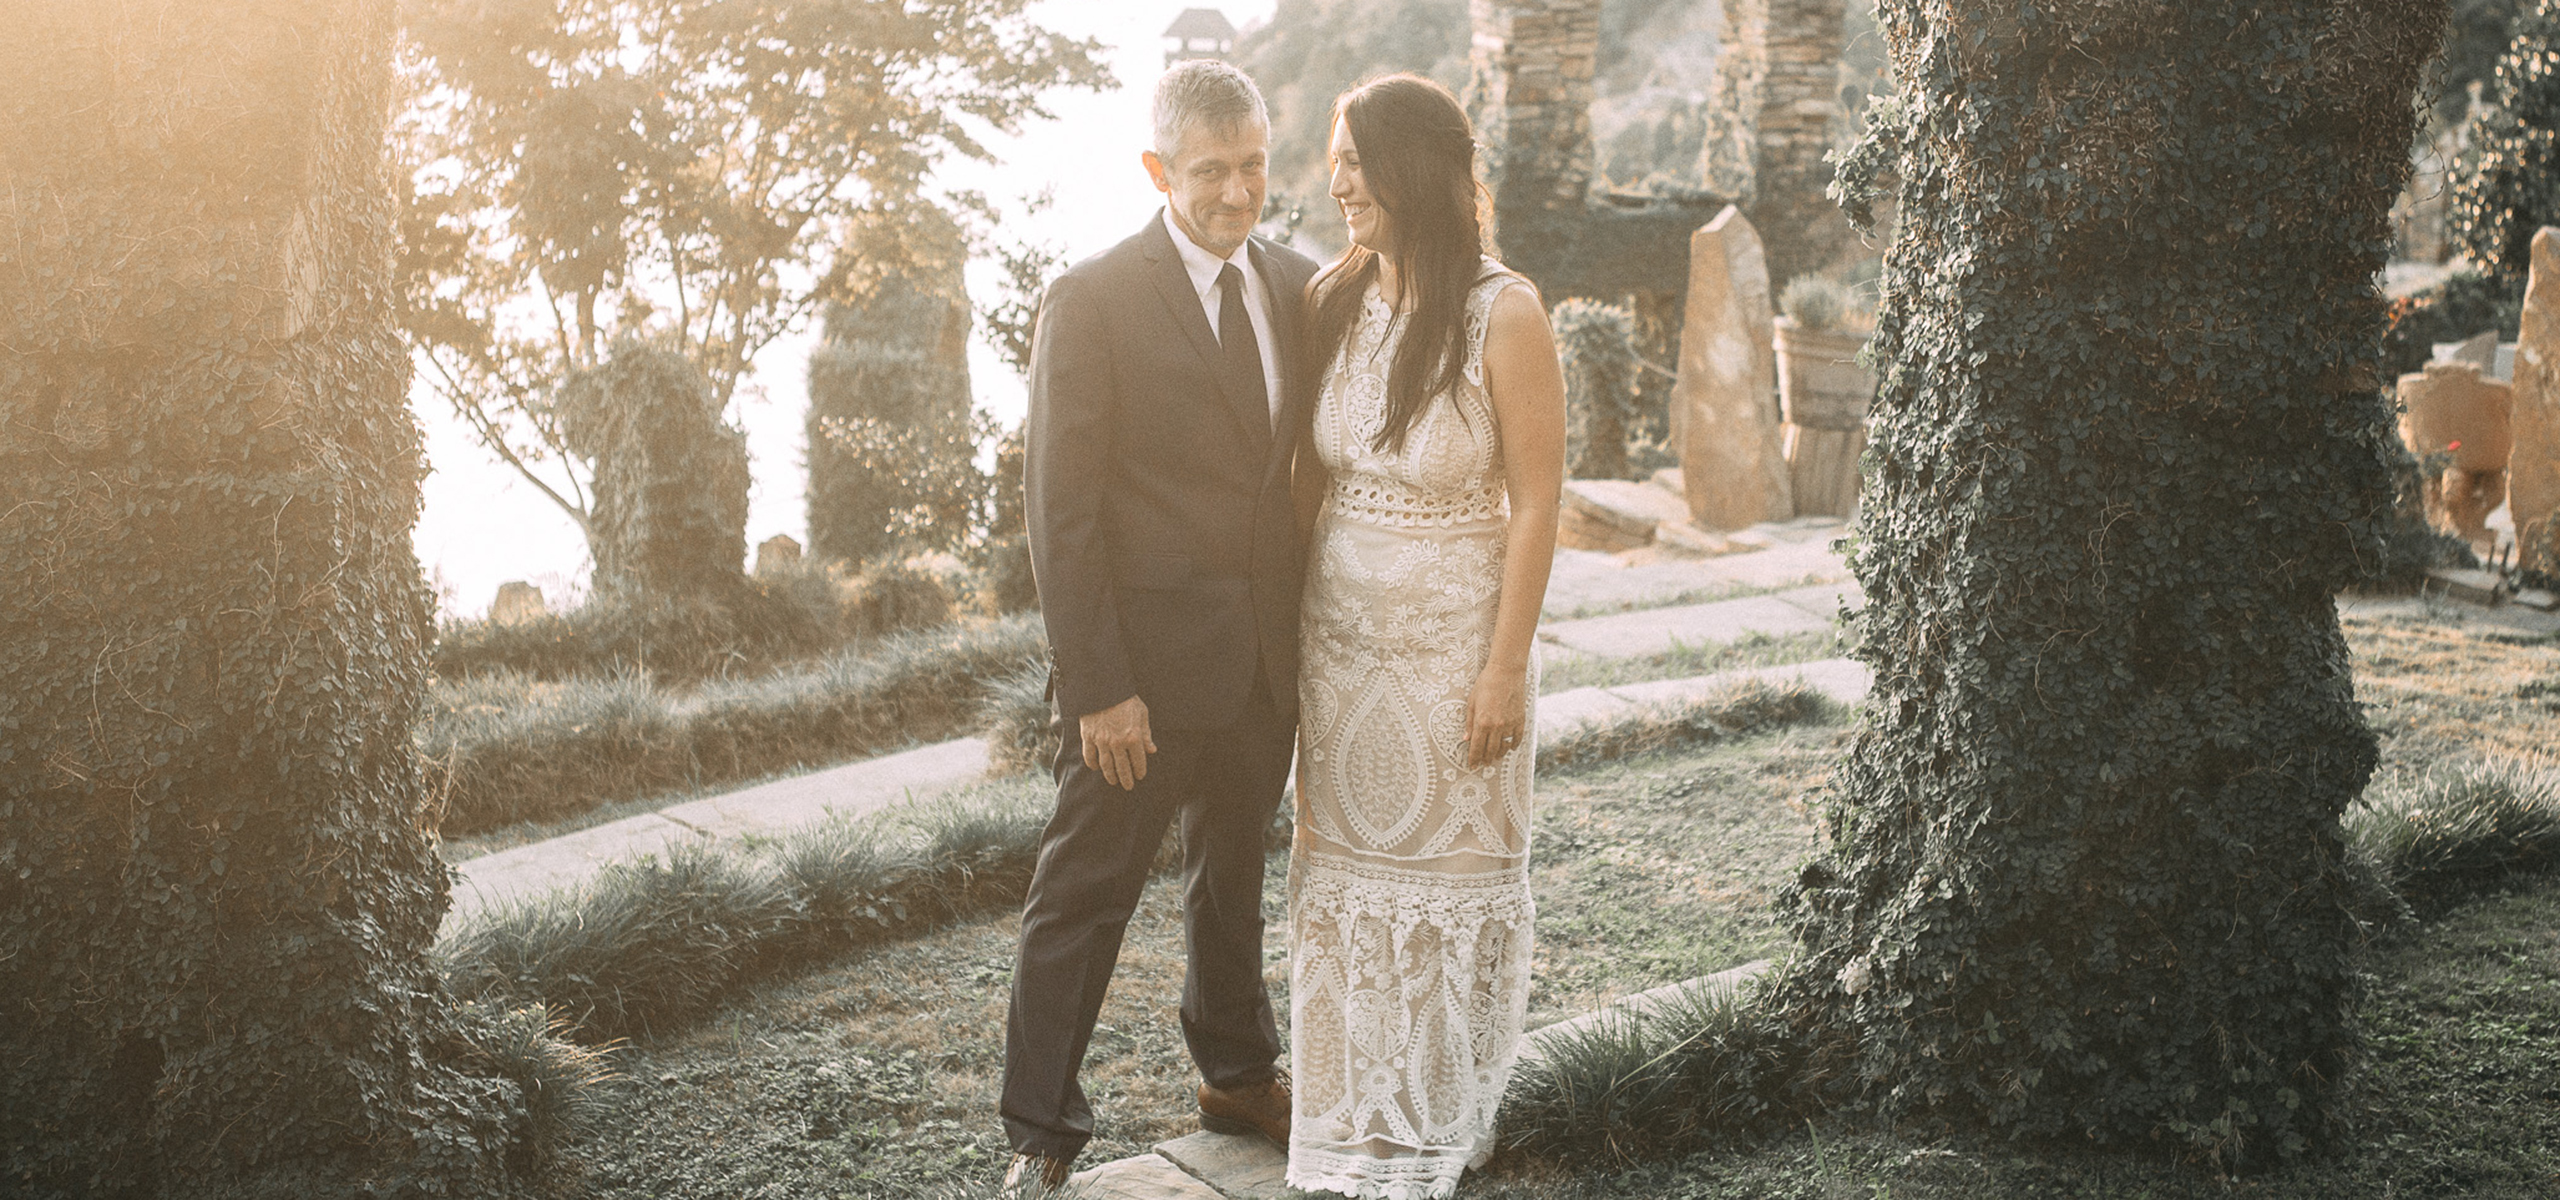 Fresno, California Wedding Photography + Elopement Photography